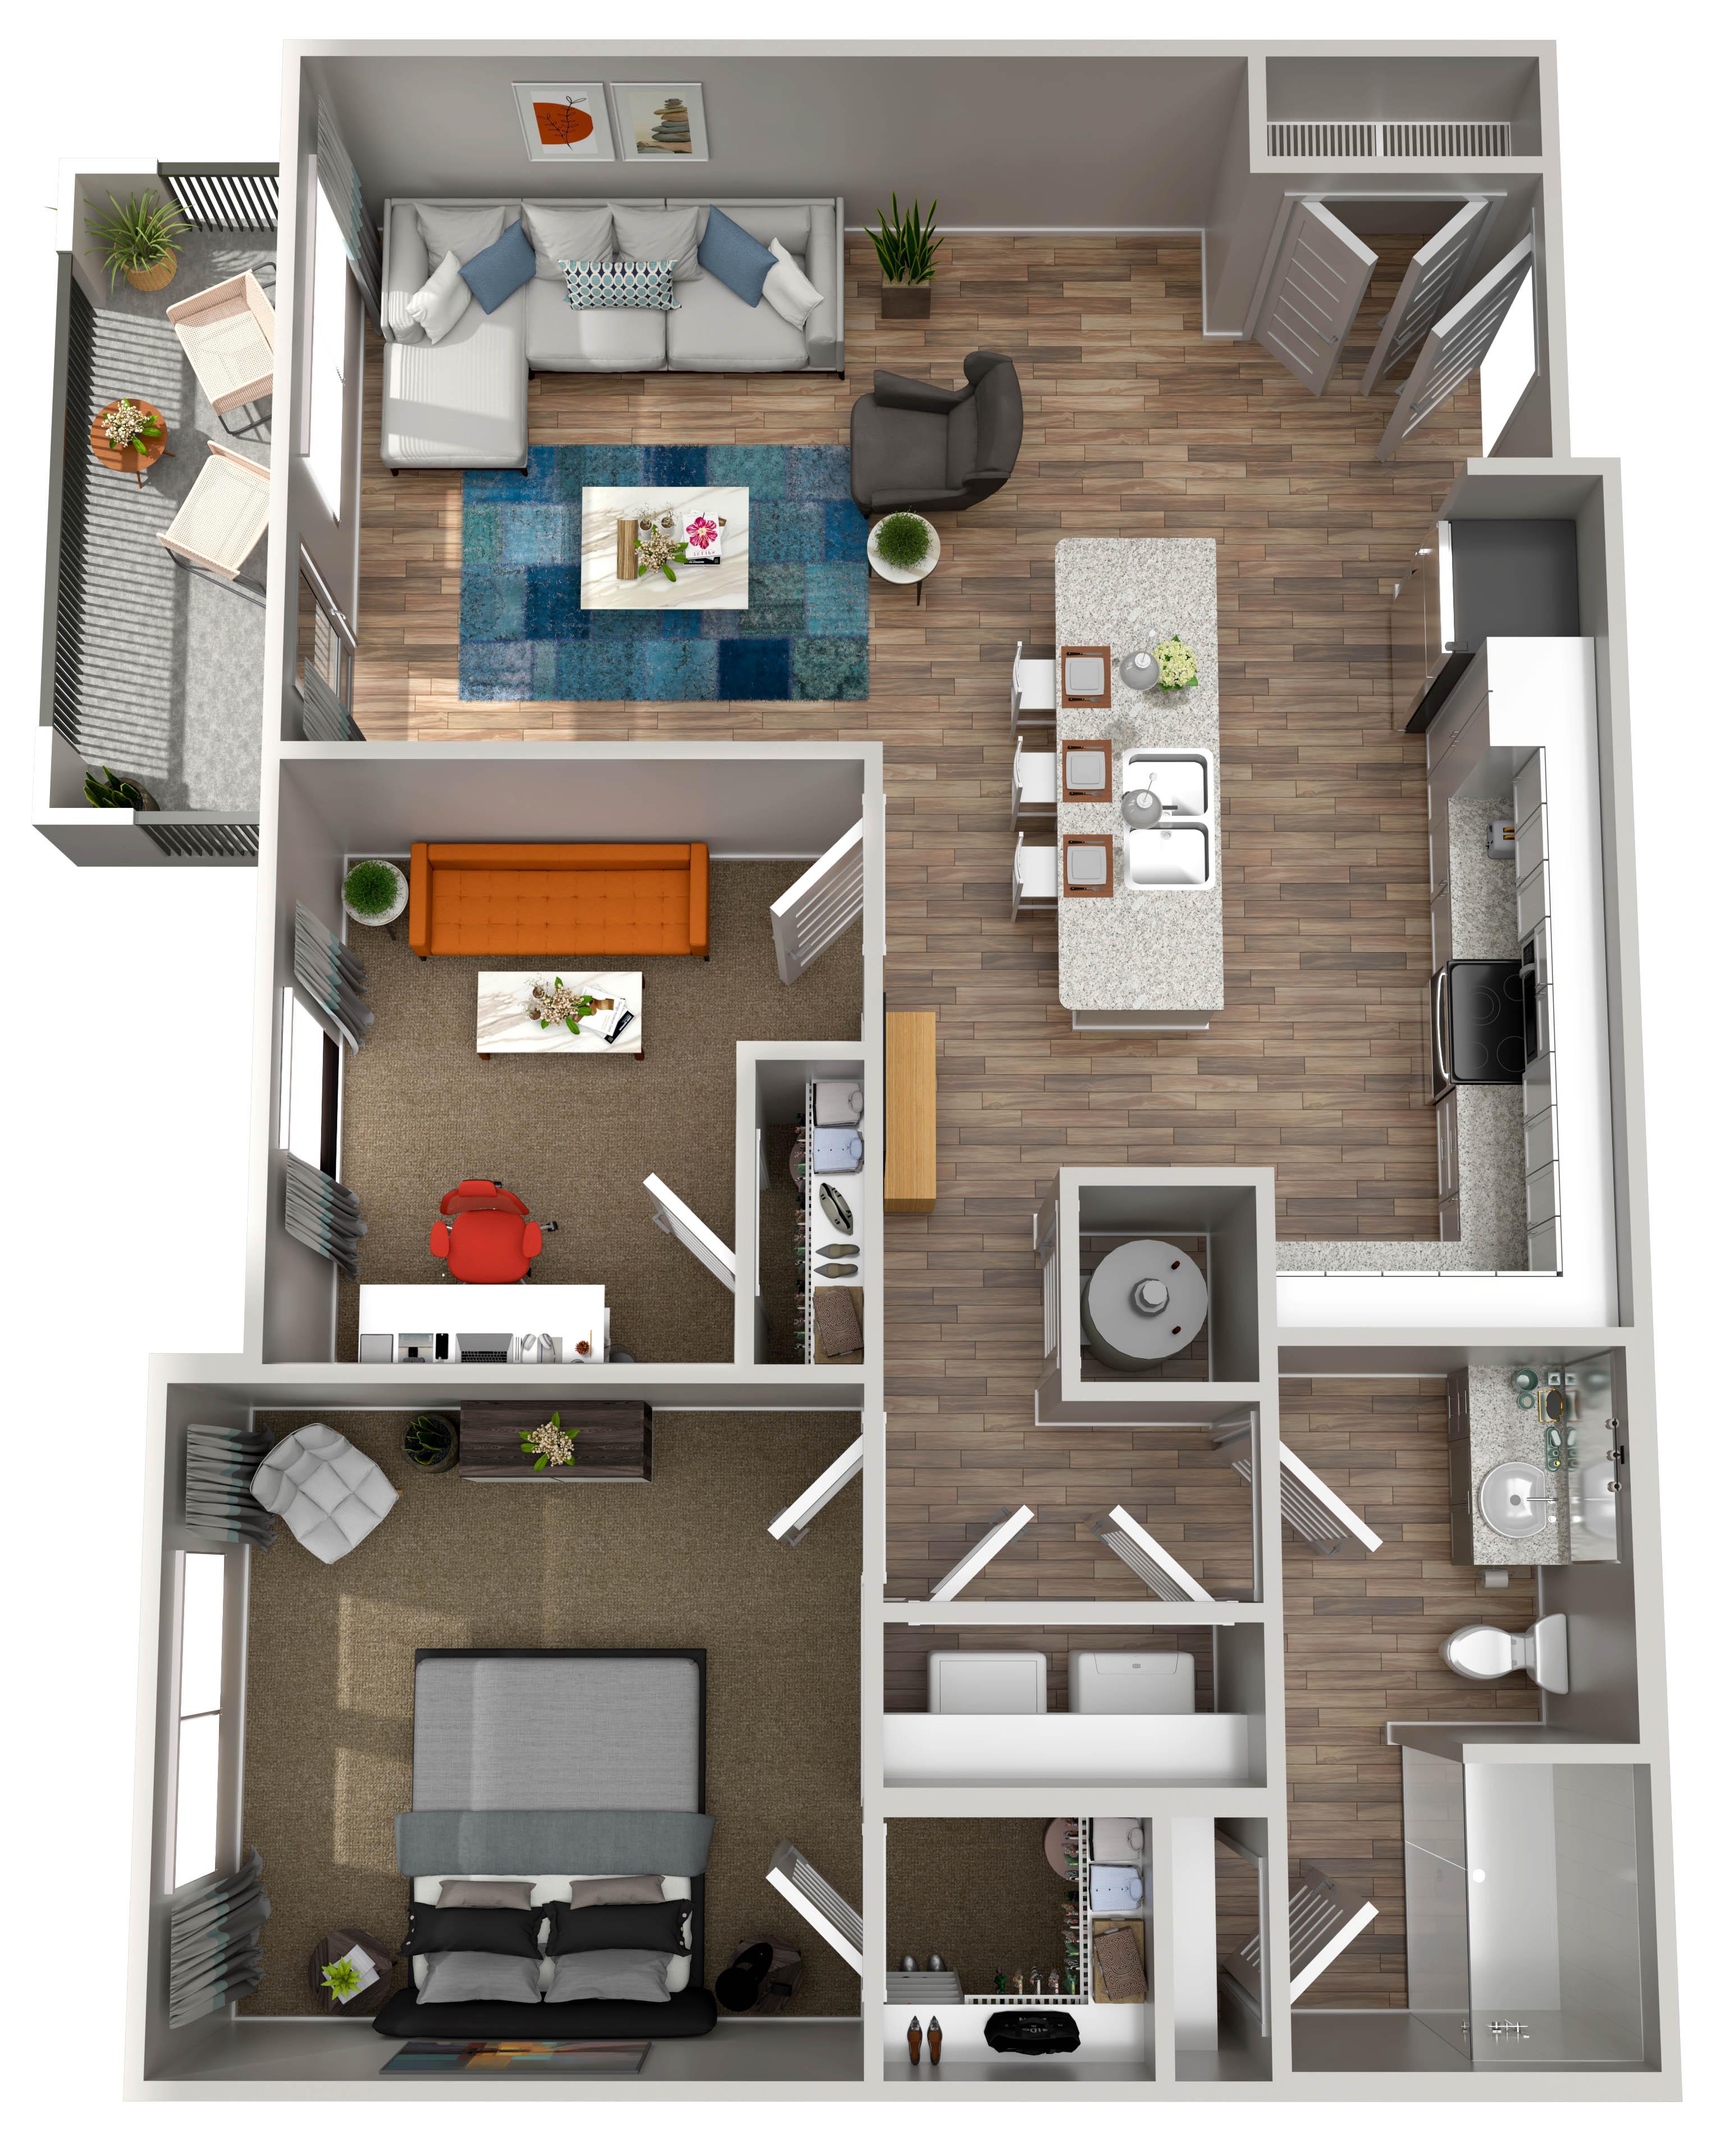 Annabelle on Main - Floorplan - A3 w/ Den